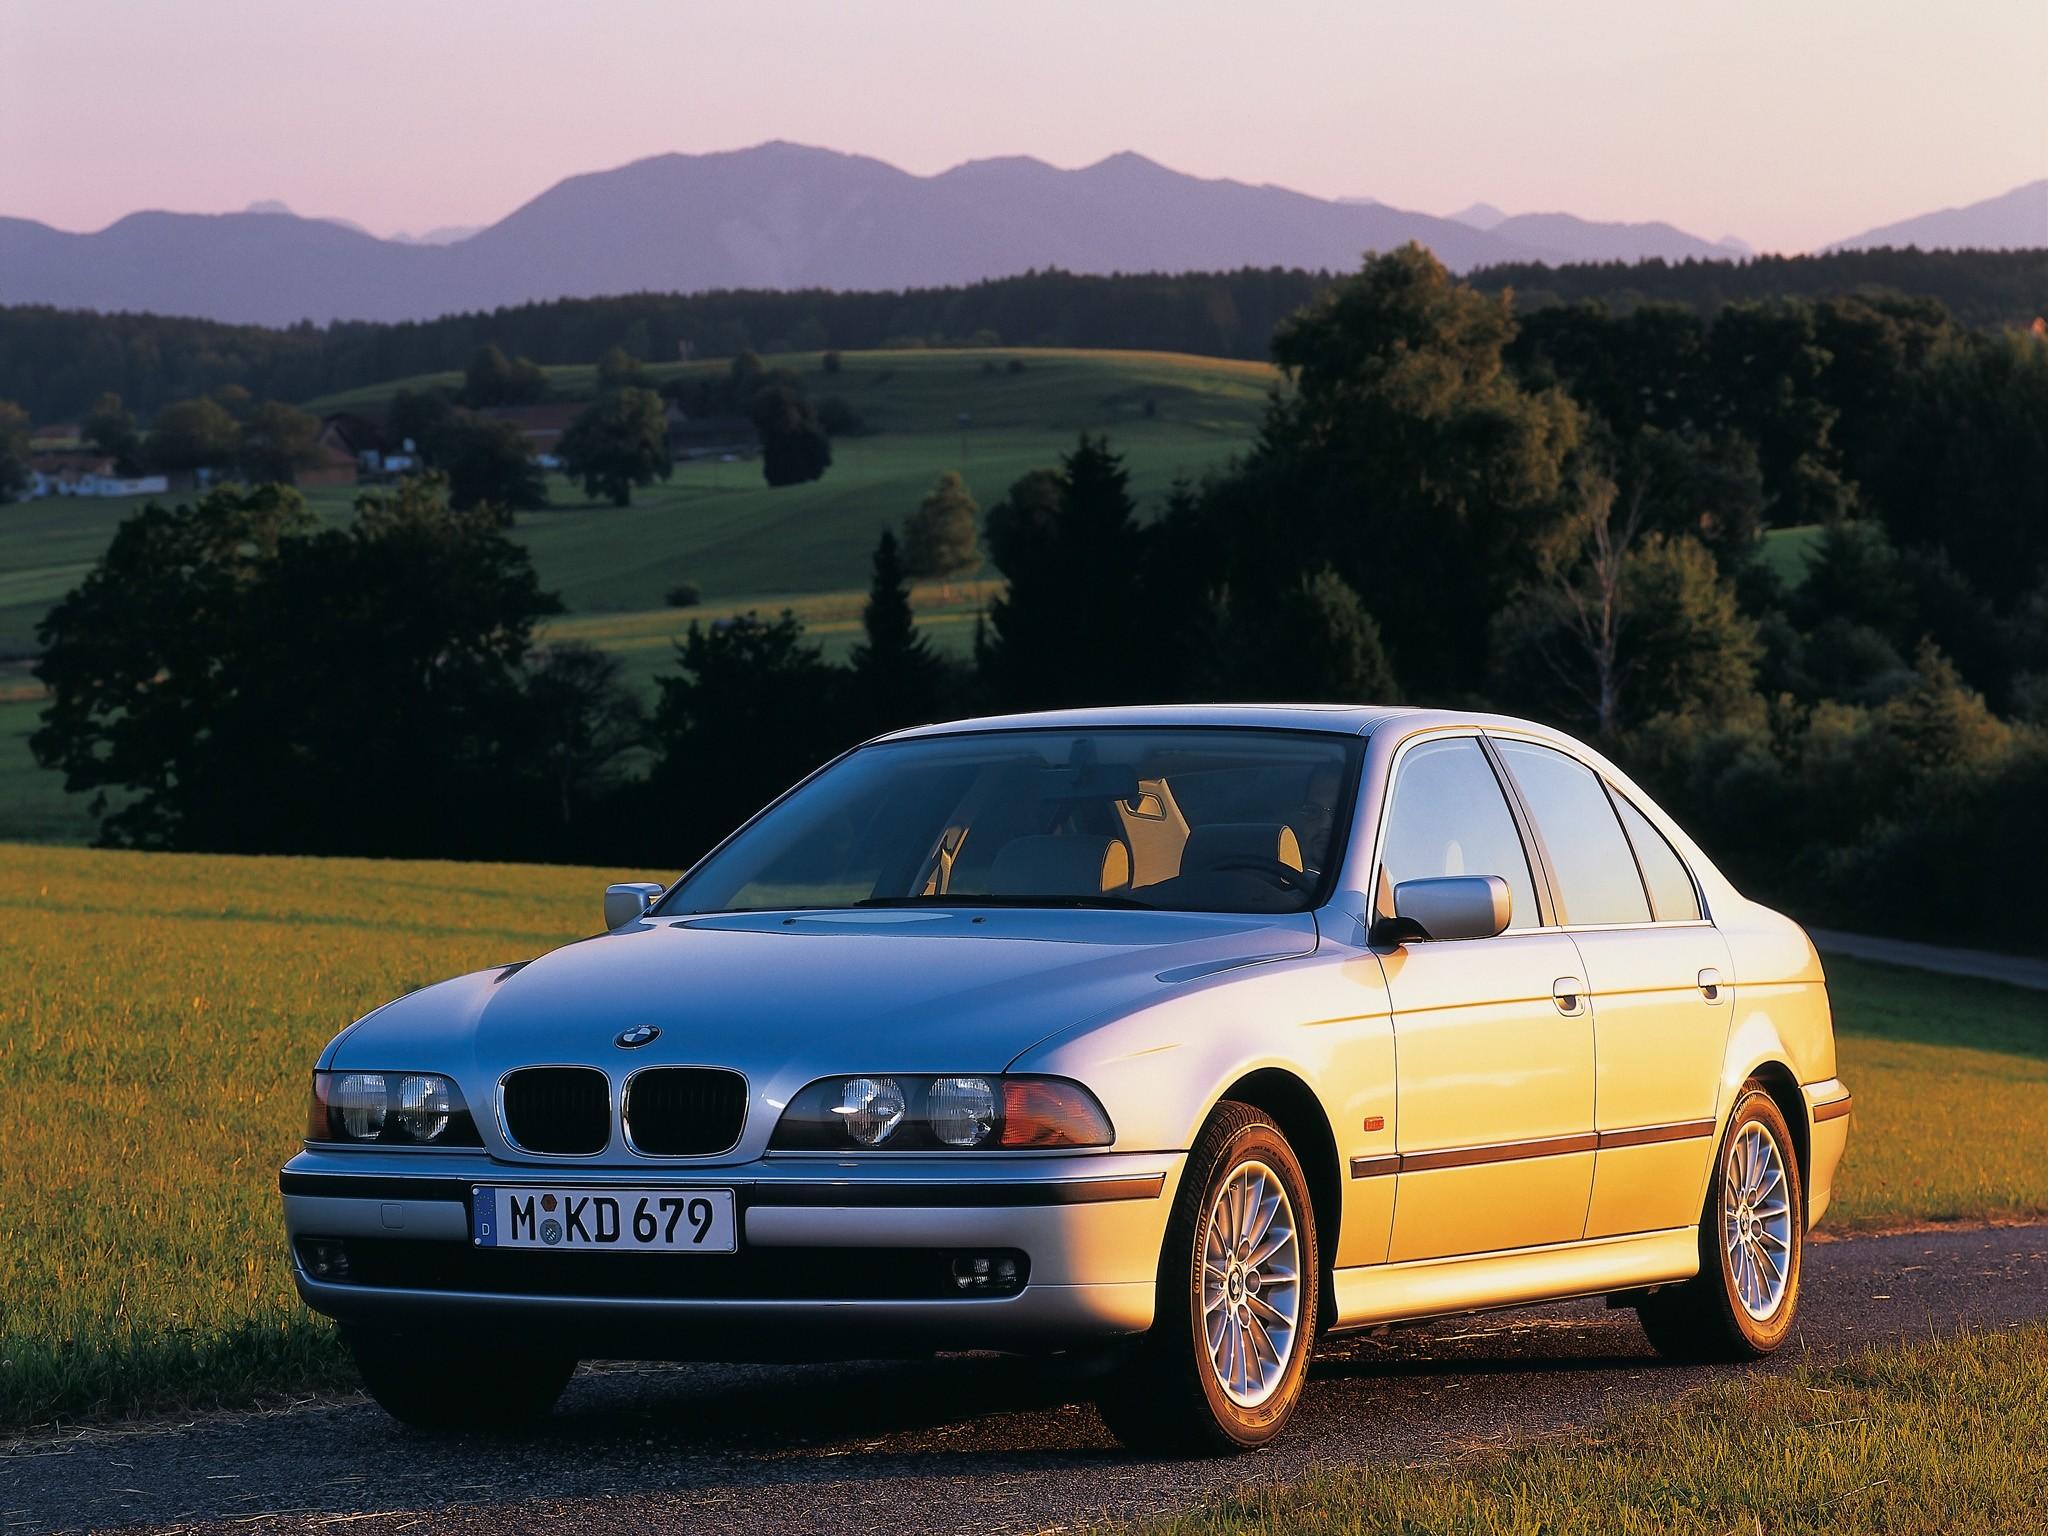 Car Steerying Wallpaper Bmw 5 Series E39 1995 1996 1997 1998 1999 2000